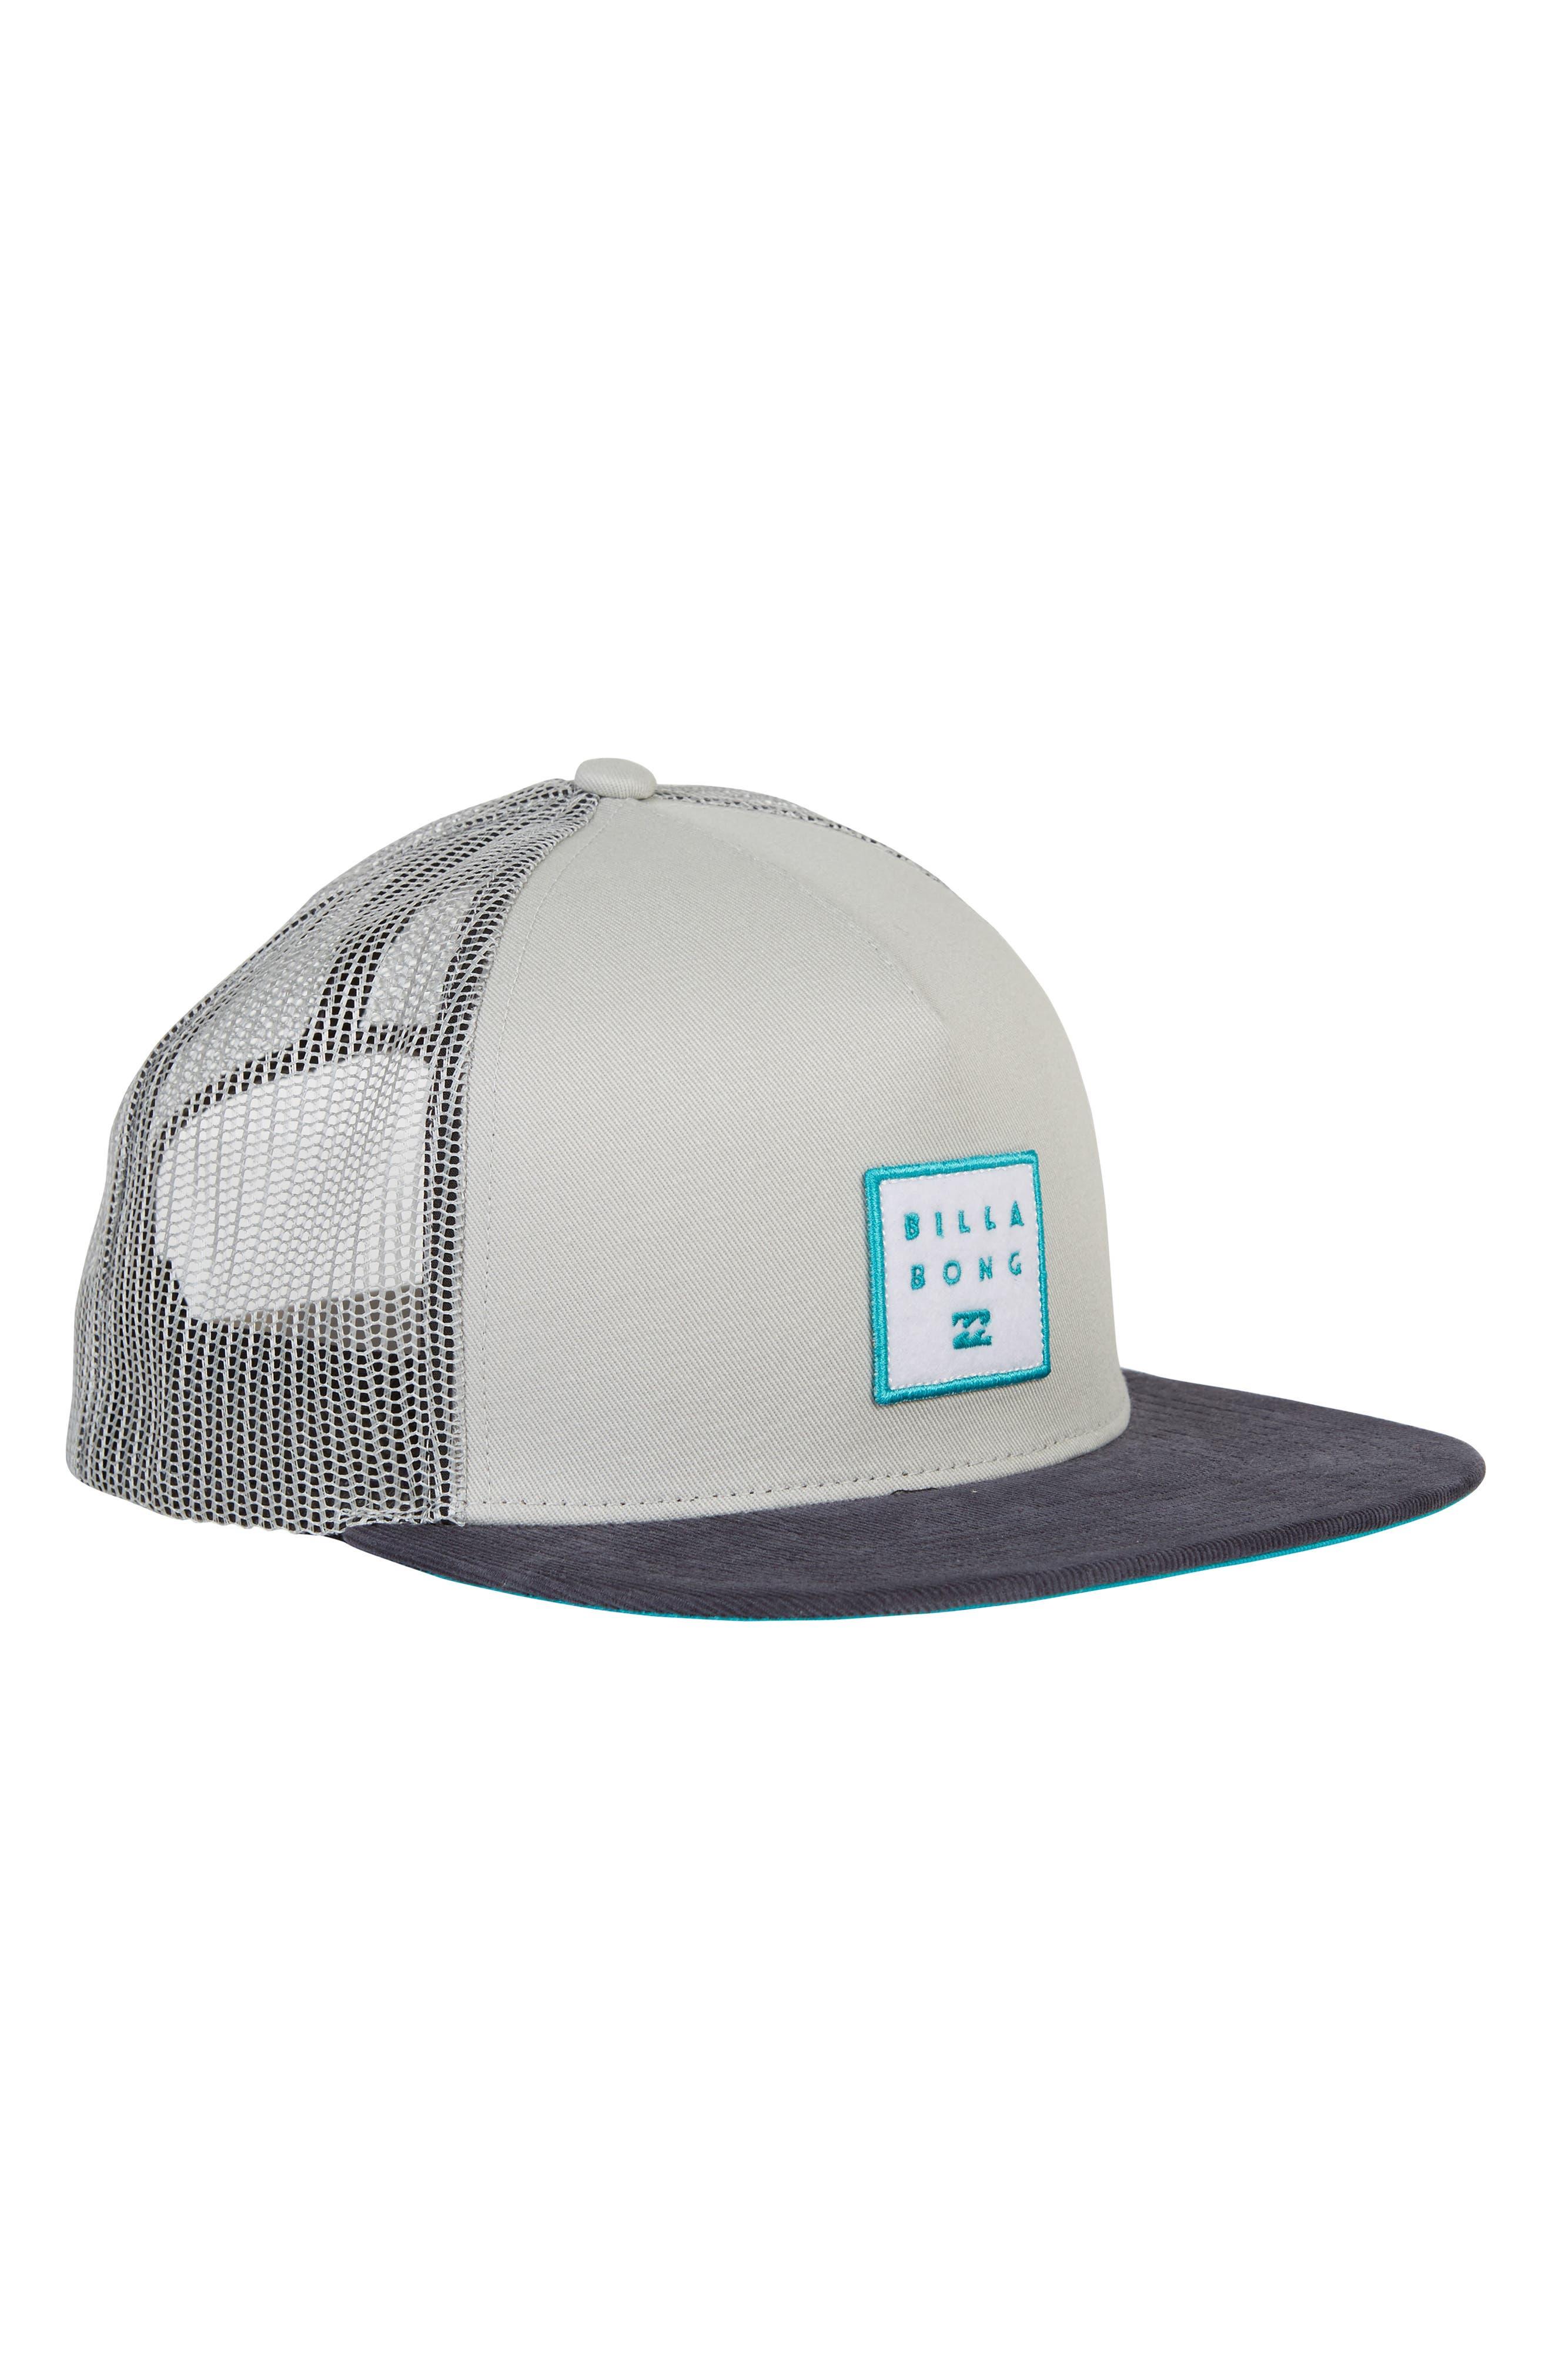 Stacked Trucker Hat,                             Alternate thumbnail 3, color,                             LIGHT GREY